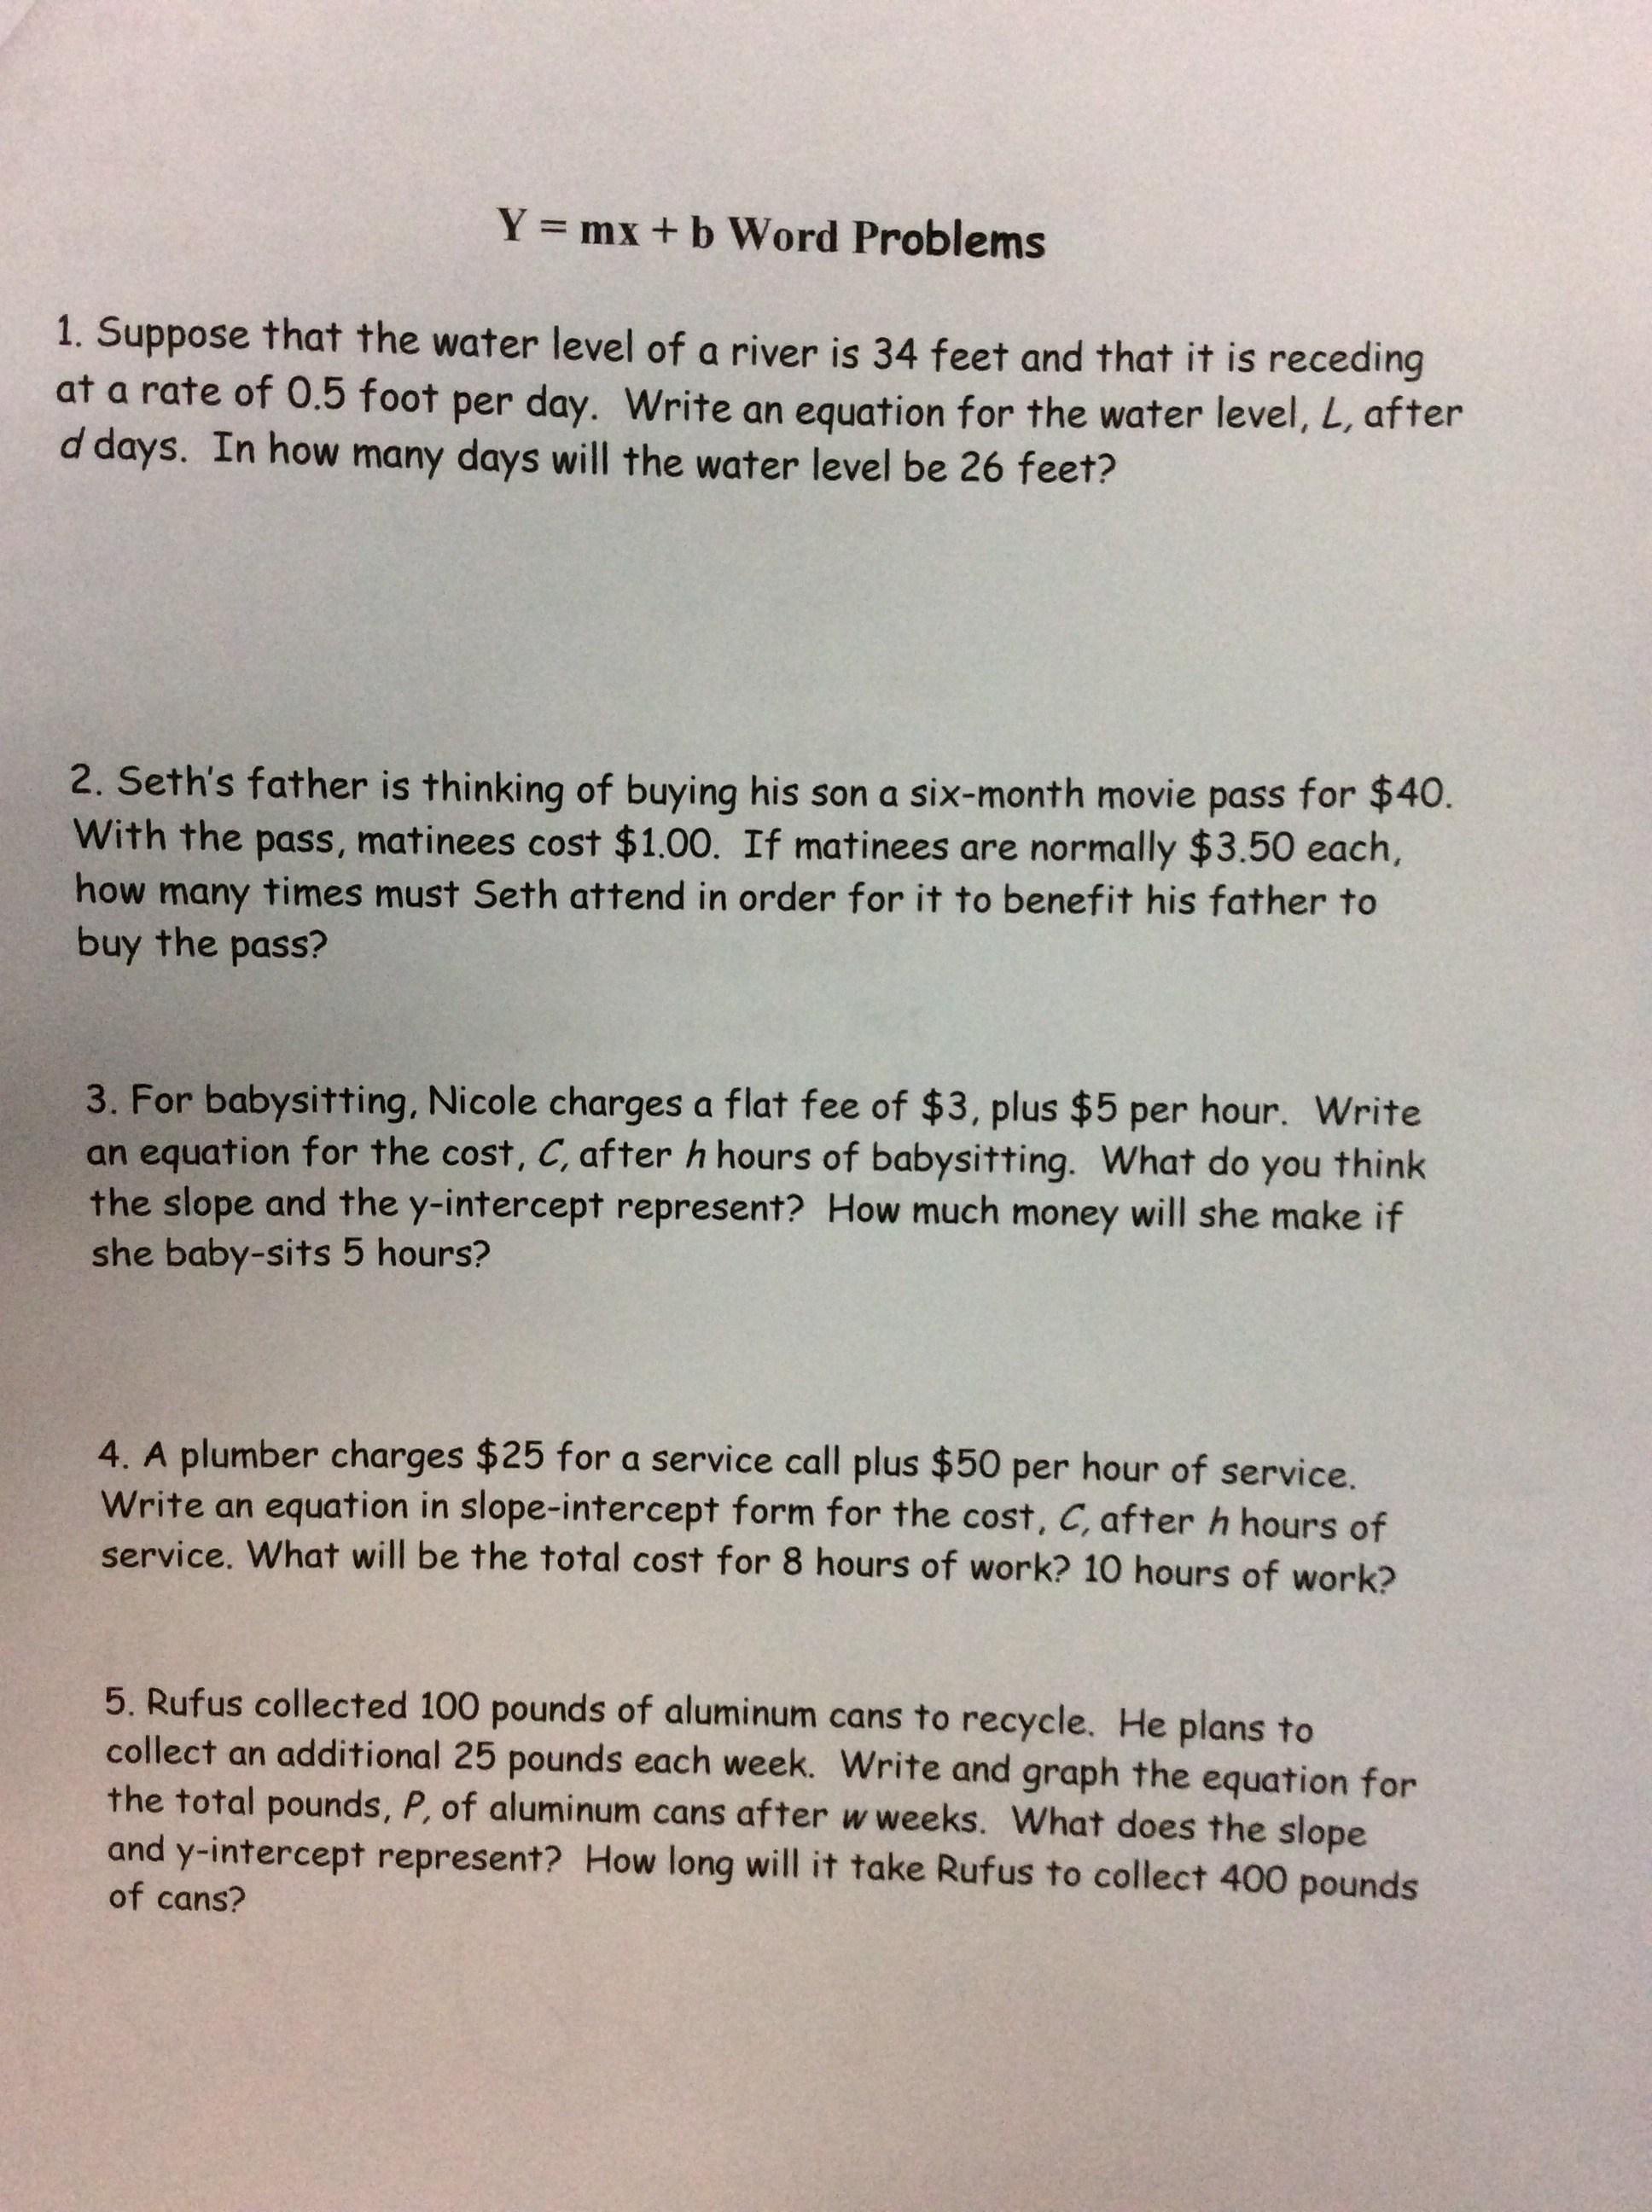 Y Mx B Word Problems Worksheet